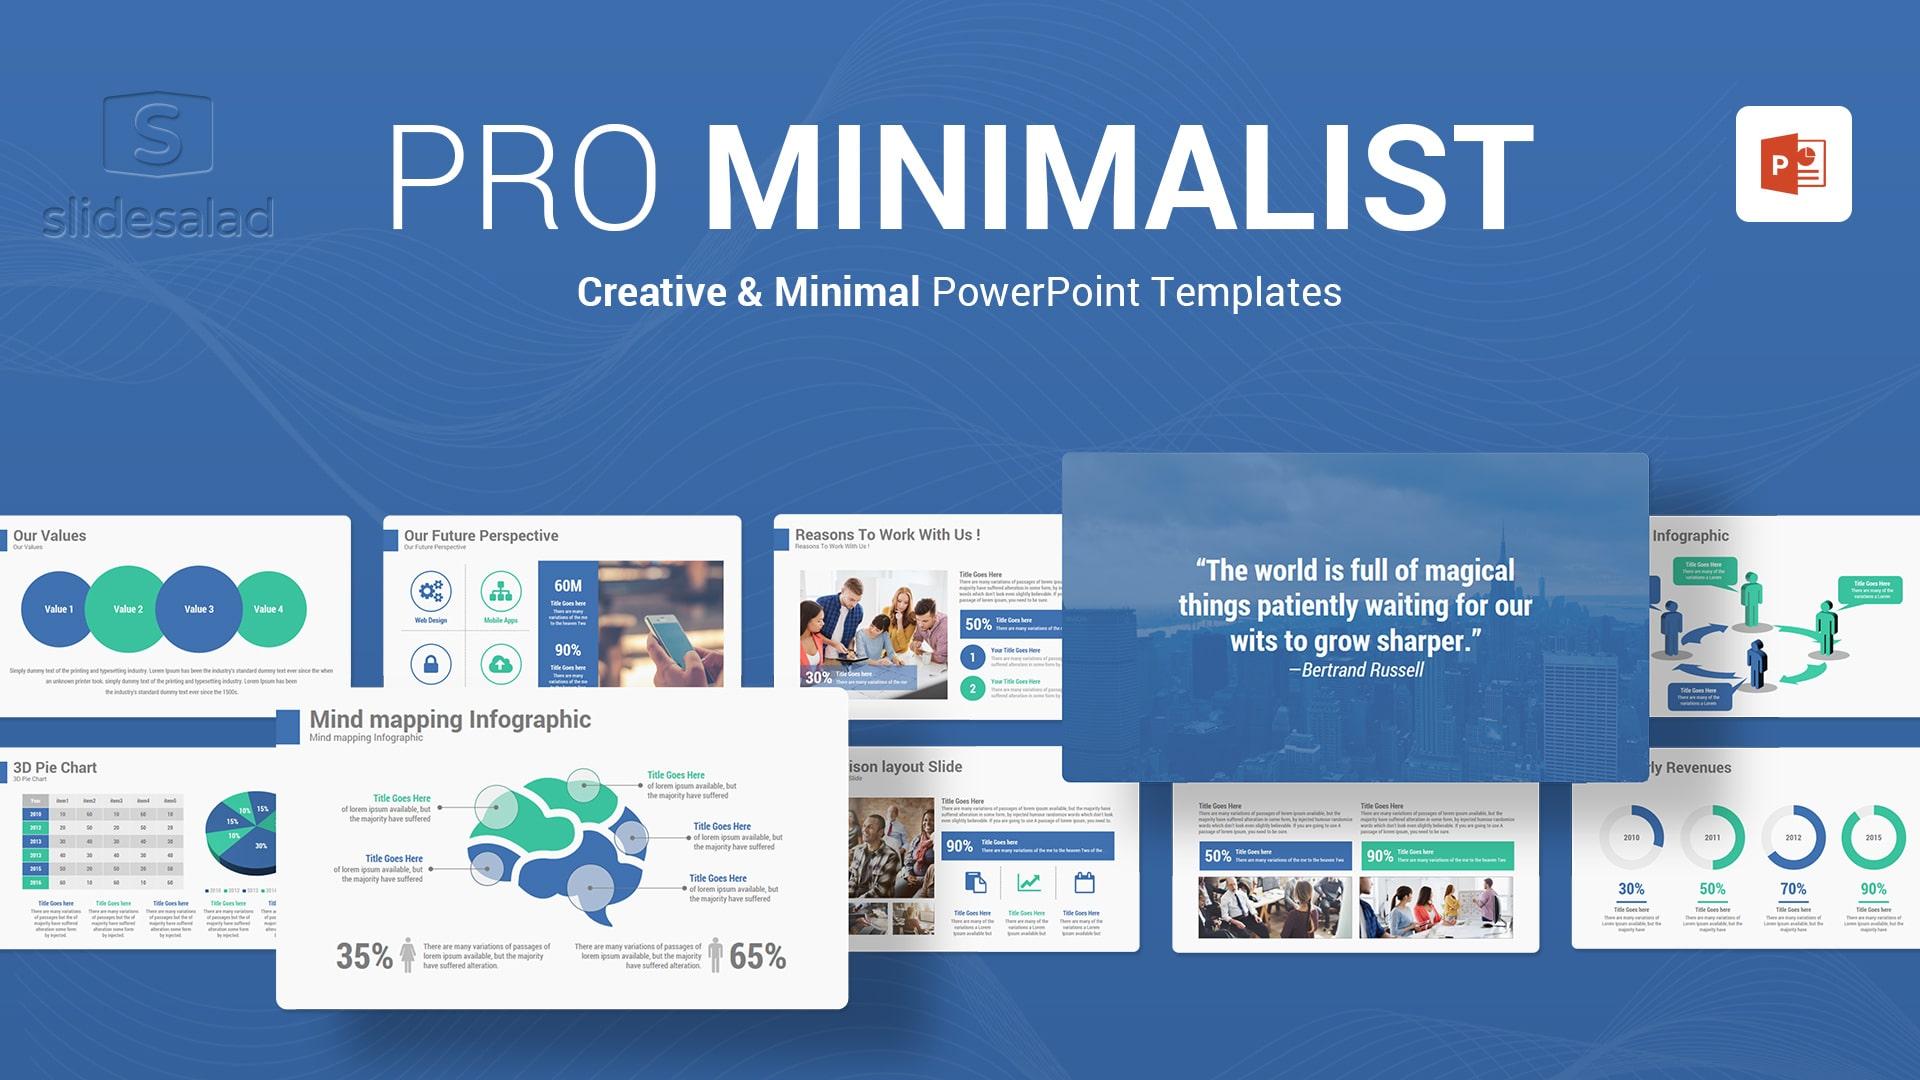 Minimalist PowerPoint Template Designs - Clean Custom PowerPoint Slide Show Template Design